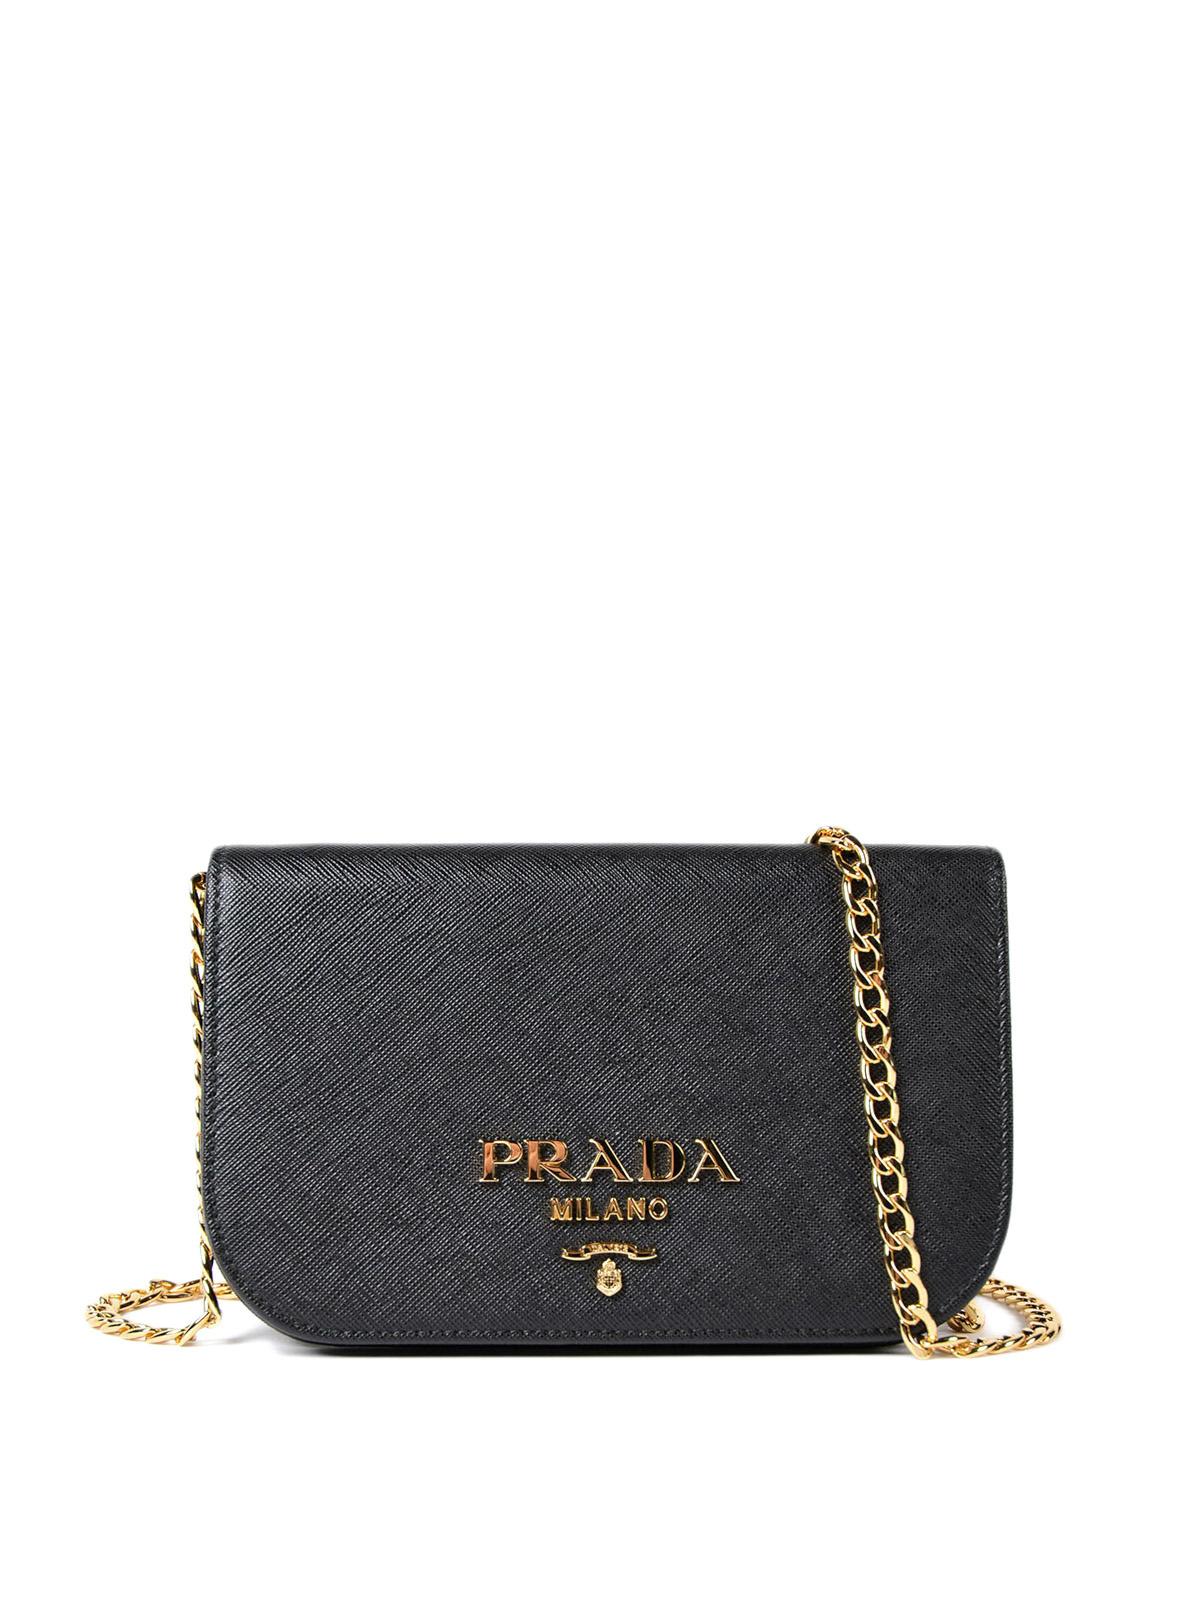 Saffiano leather small black bag by Prada